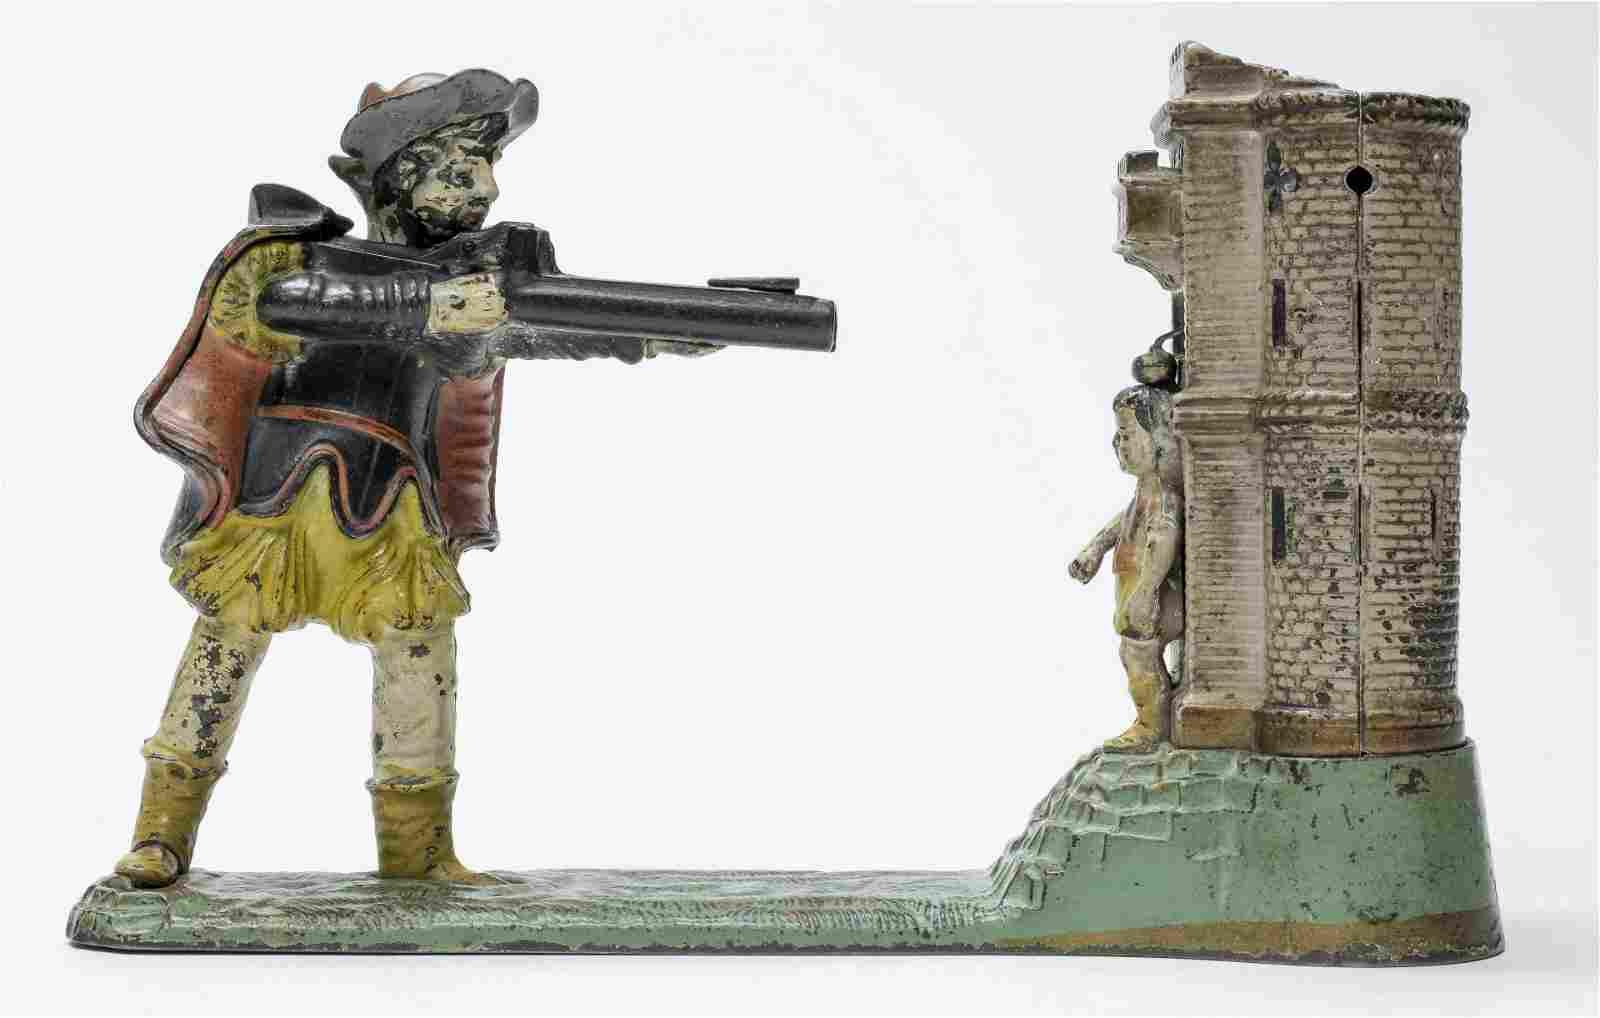 William Tell Iron Mechanical Bank